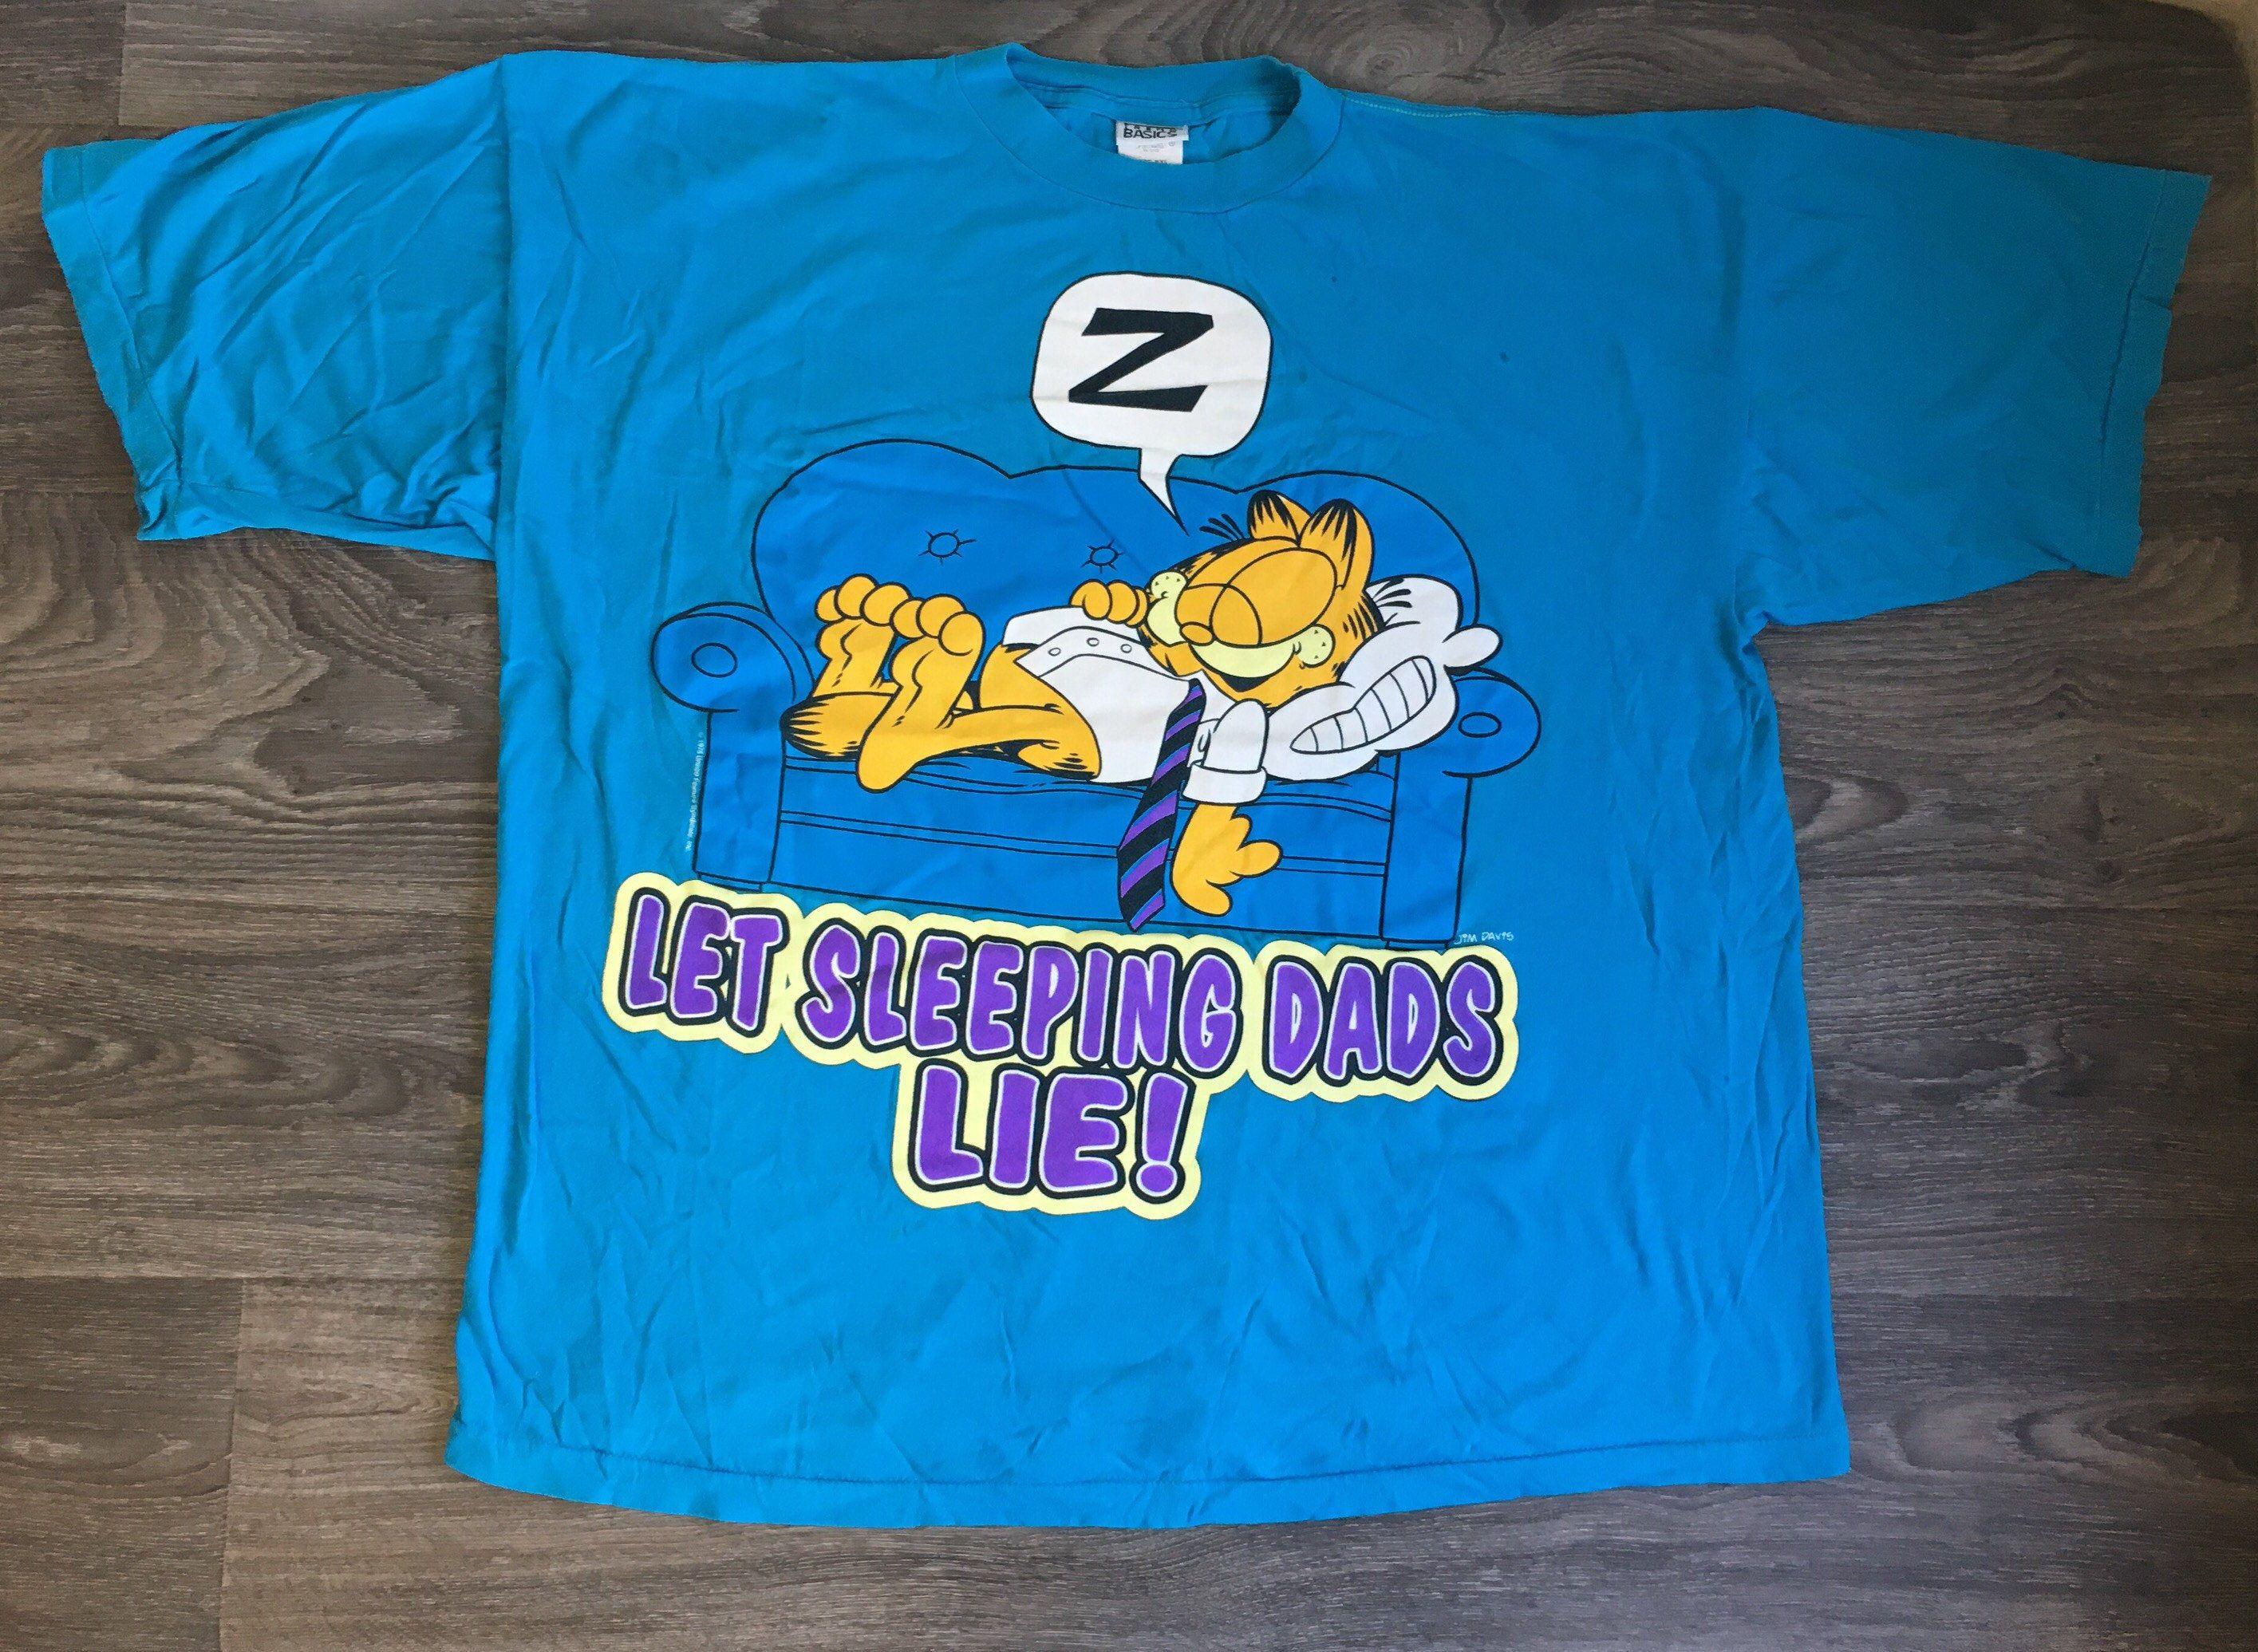 Vintage 1980s 80s Captain Garfield Tee Shirt 6dSx6